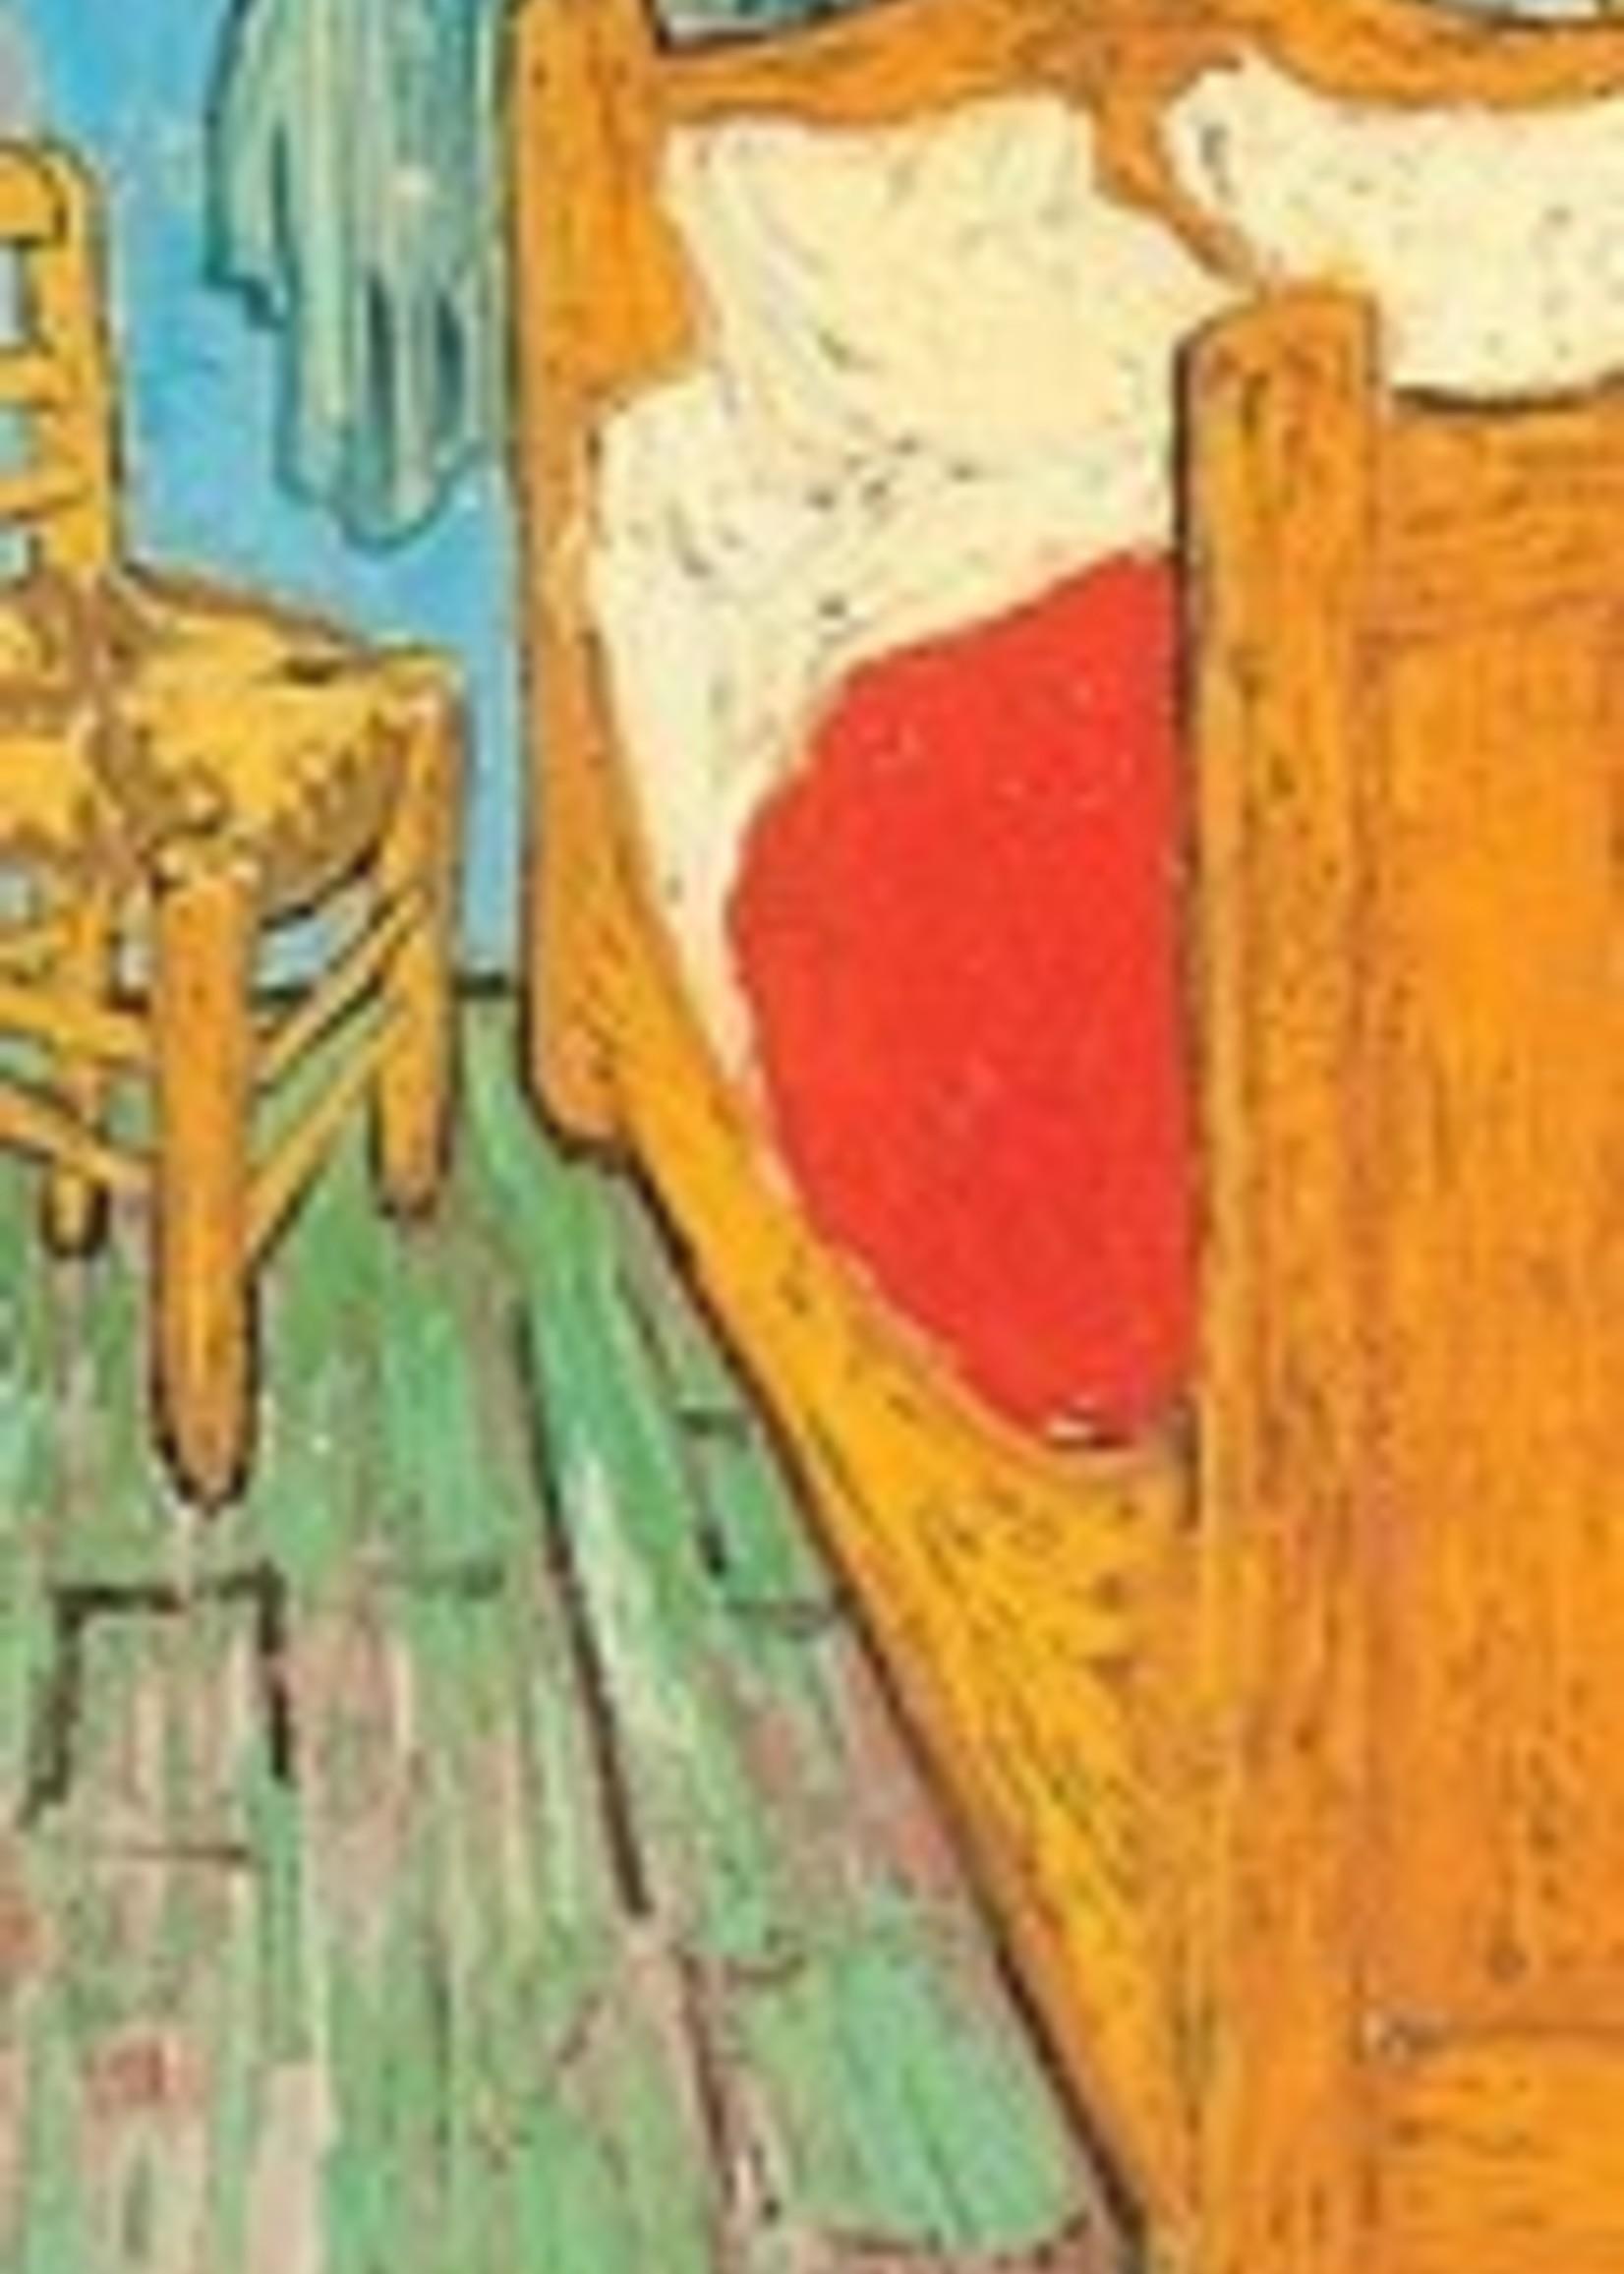 The Bedroom Bookmark by Vincent van Gogh